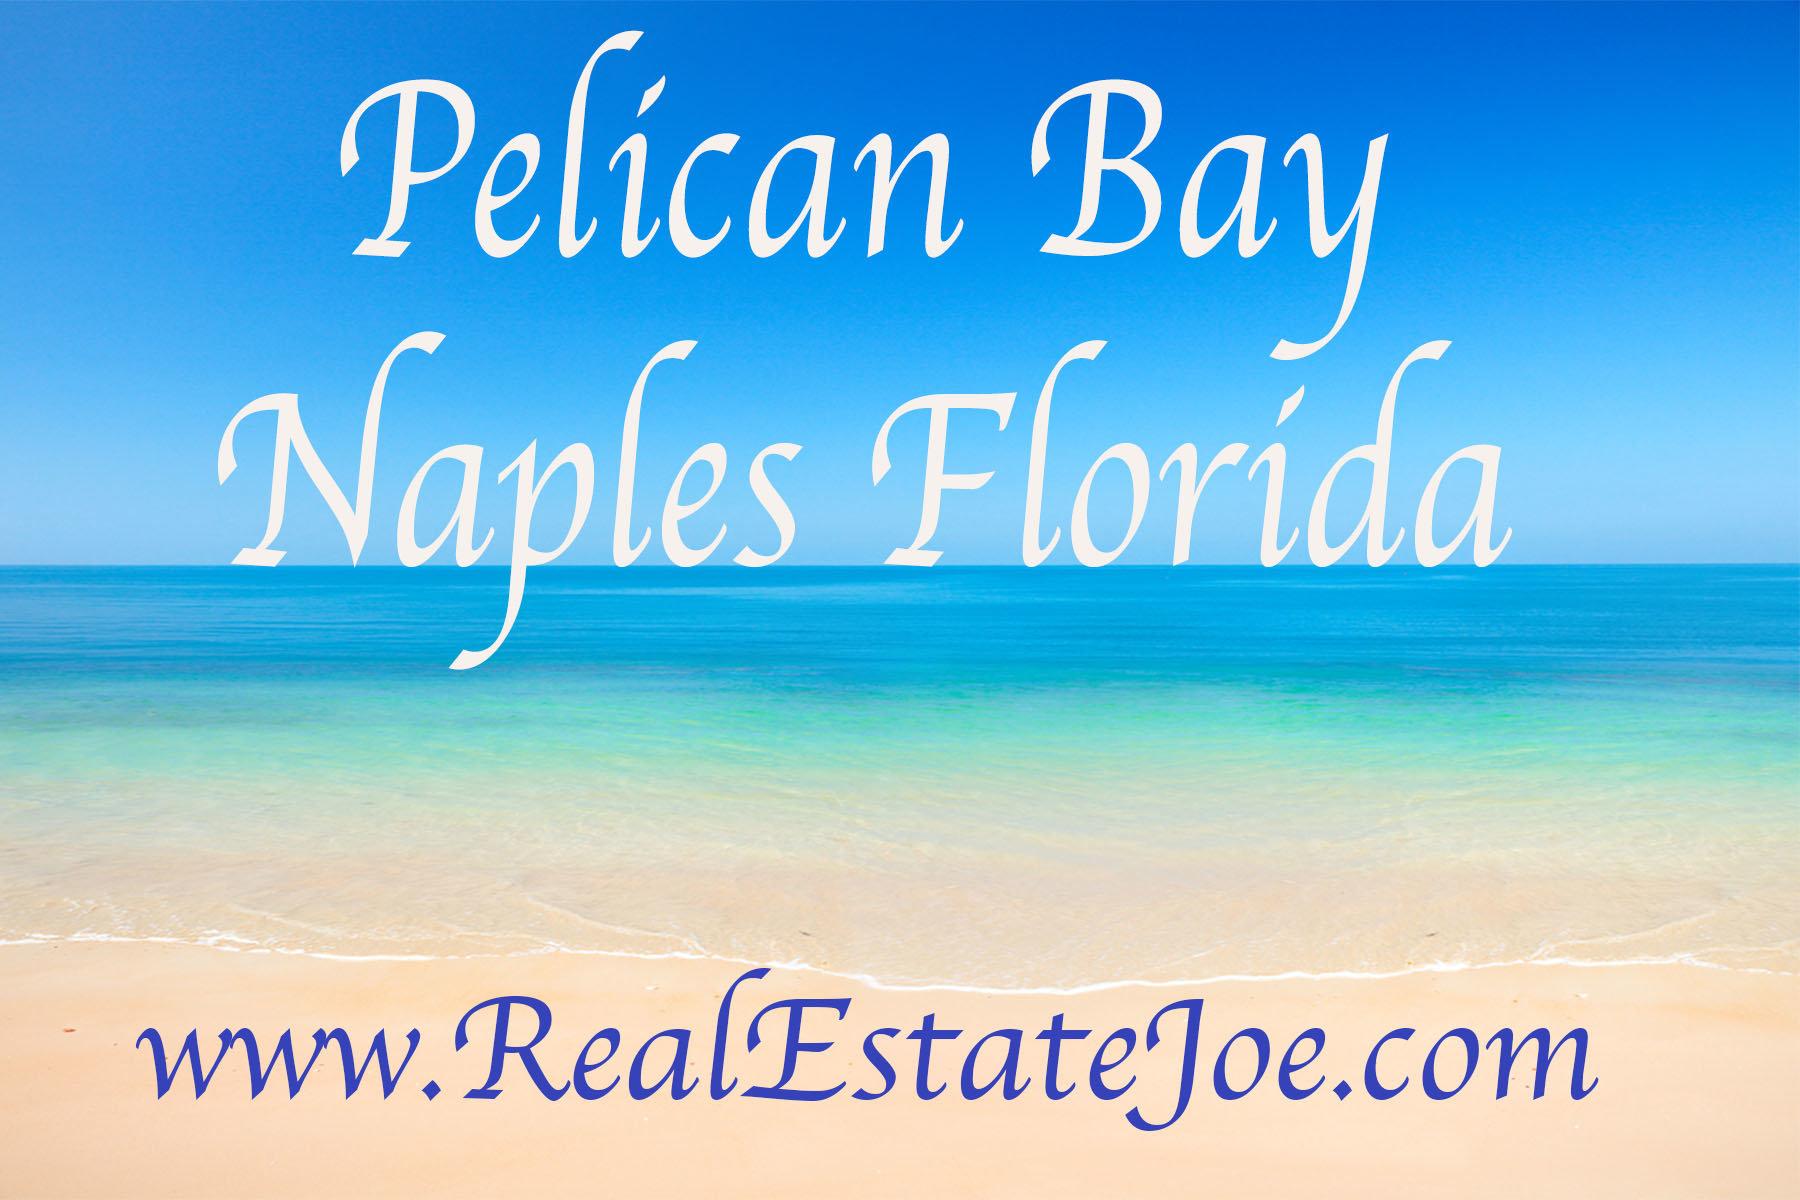 Pelican Bay homes for sale in Naples Fl | Pelican Bay Real